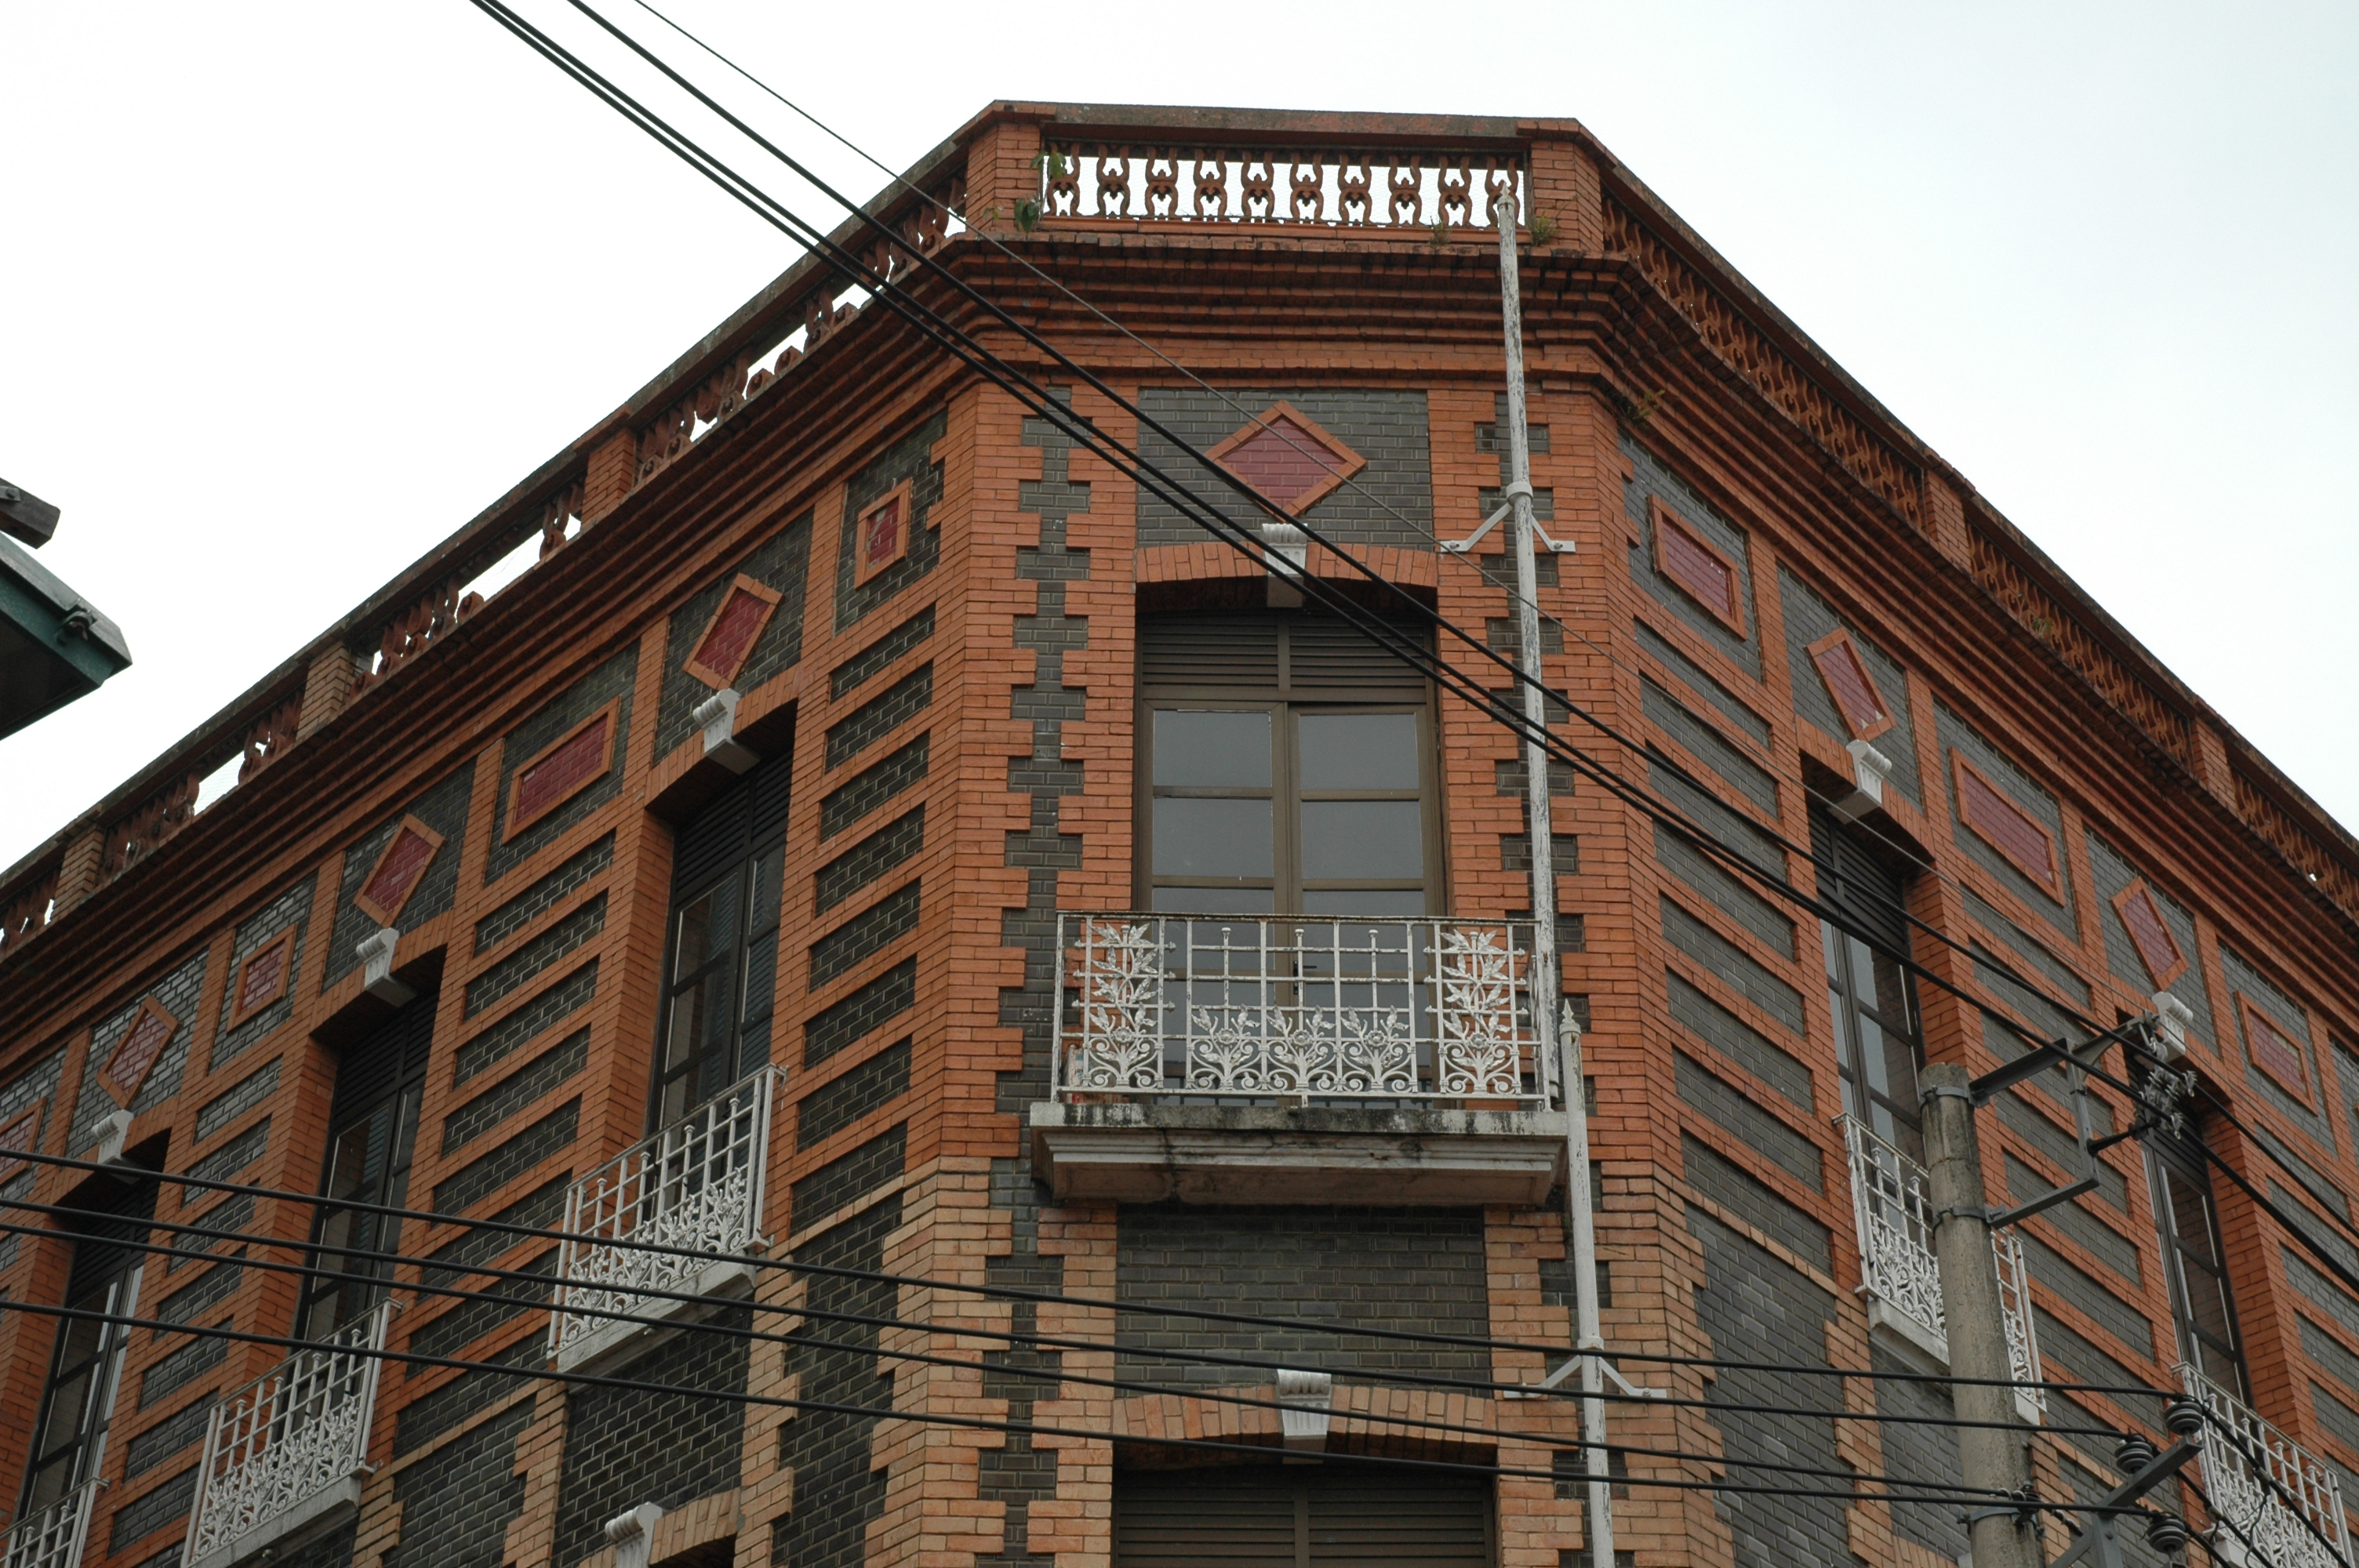 AM_Manaus_Rua_Marechal_Deodoro